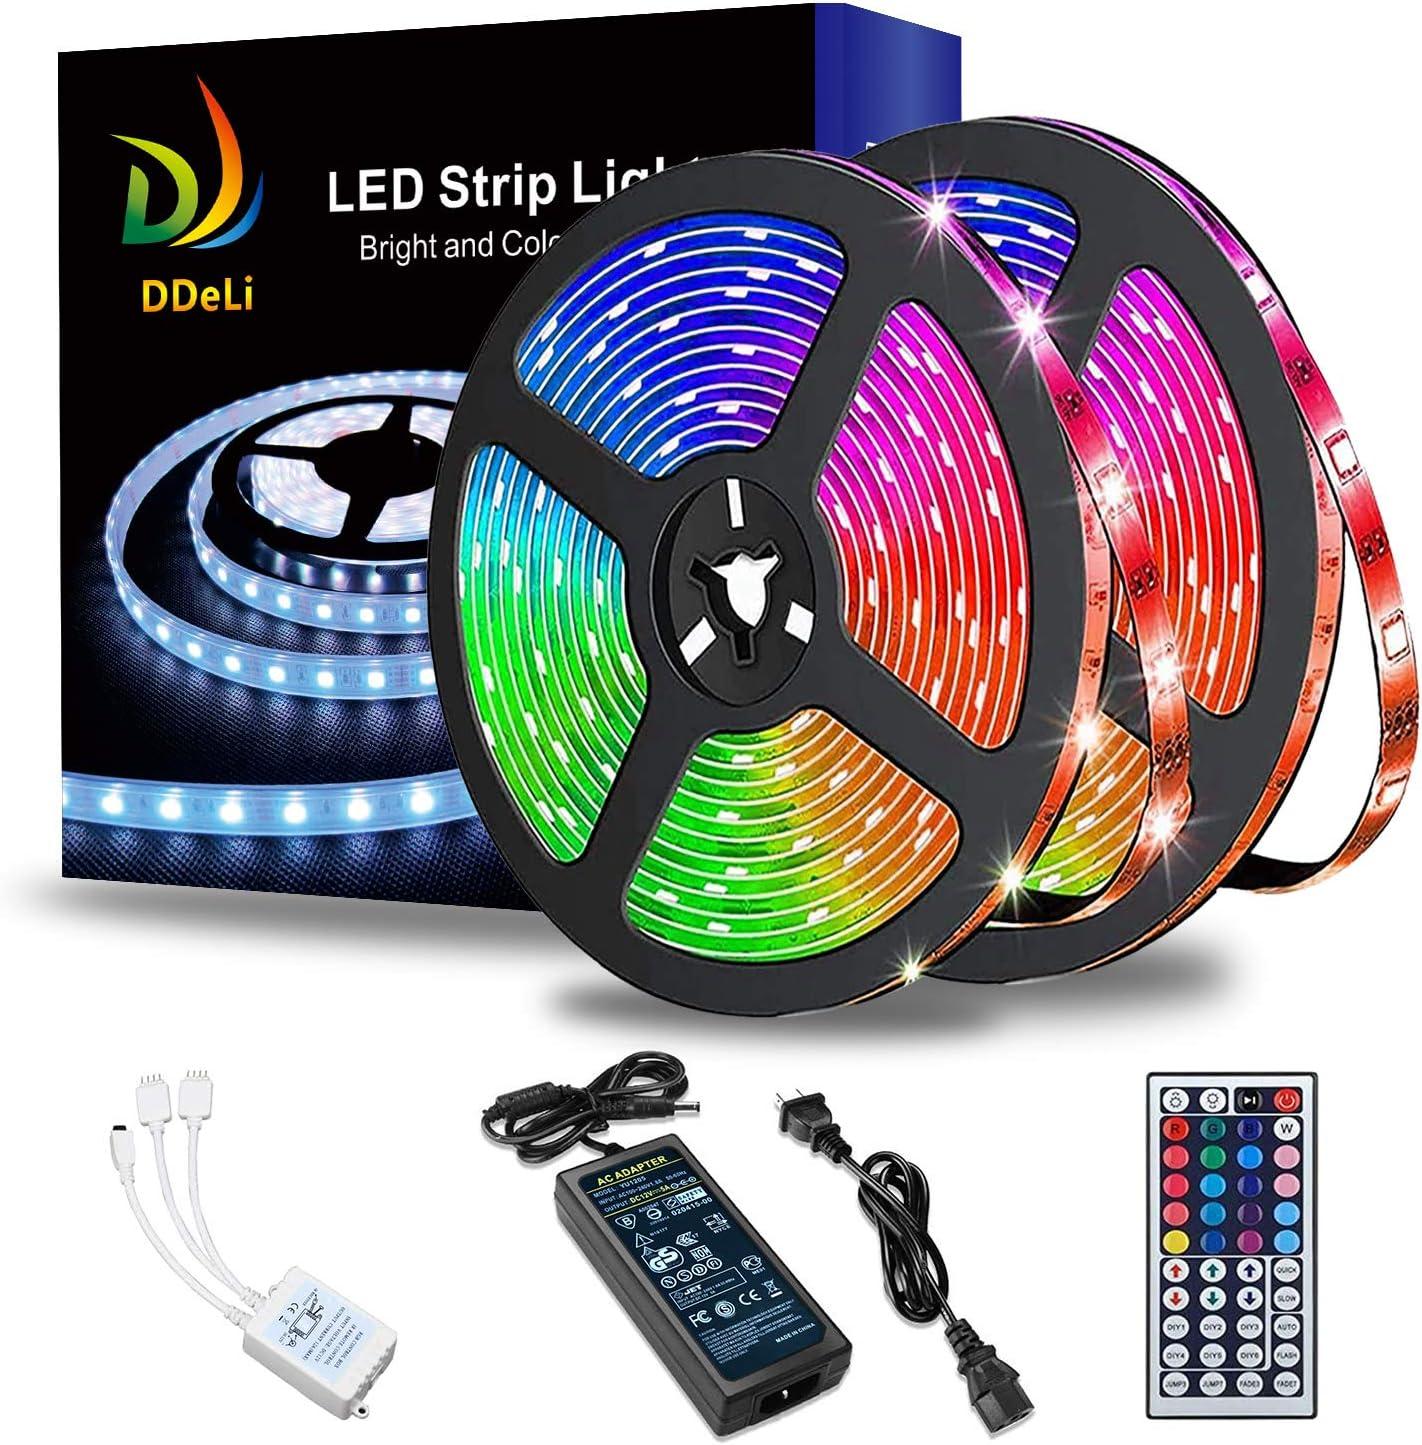 Classic DDeLi LED Strip Lights Waterproof 5050 RGB Super sale period limited Rope 32.8ft Light